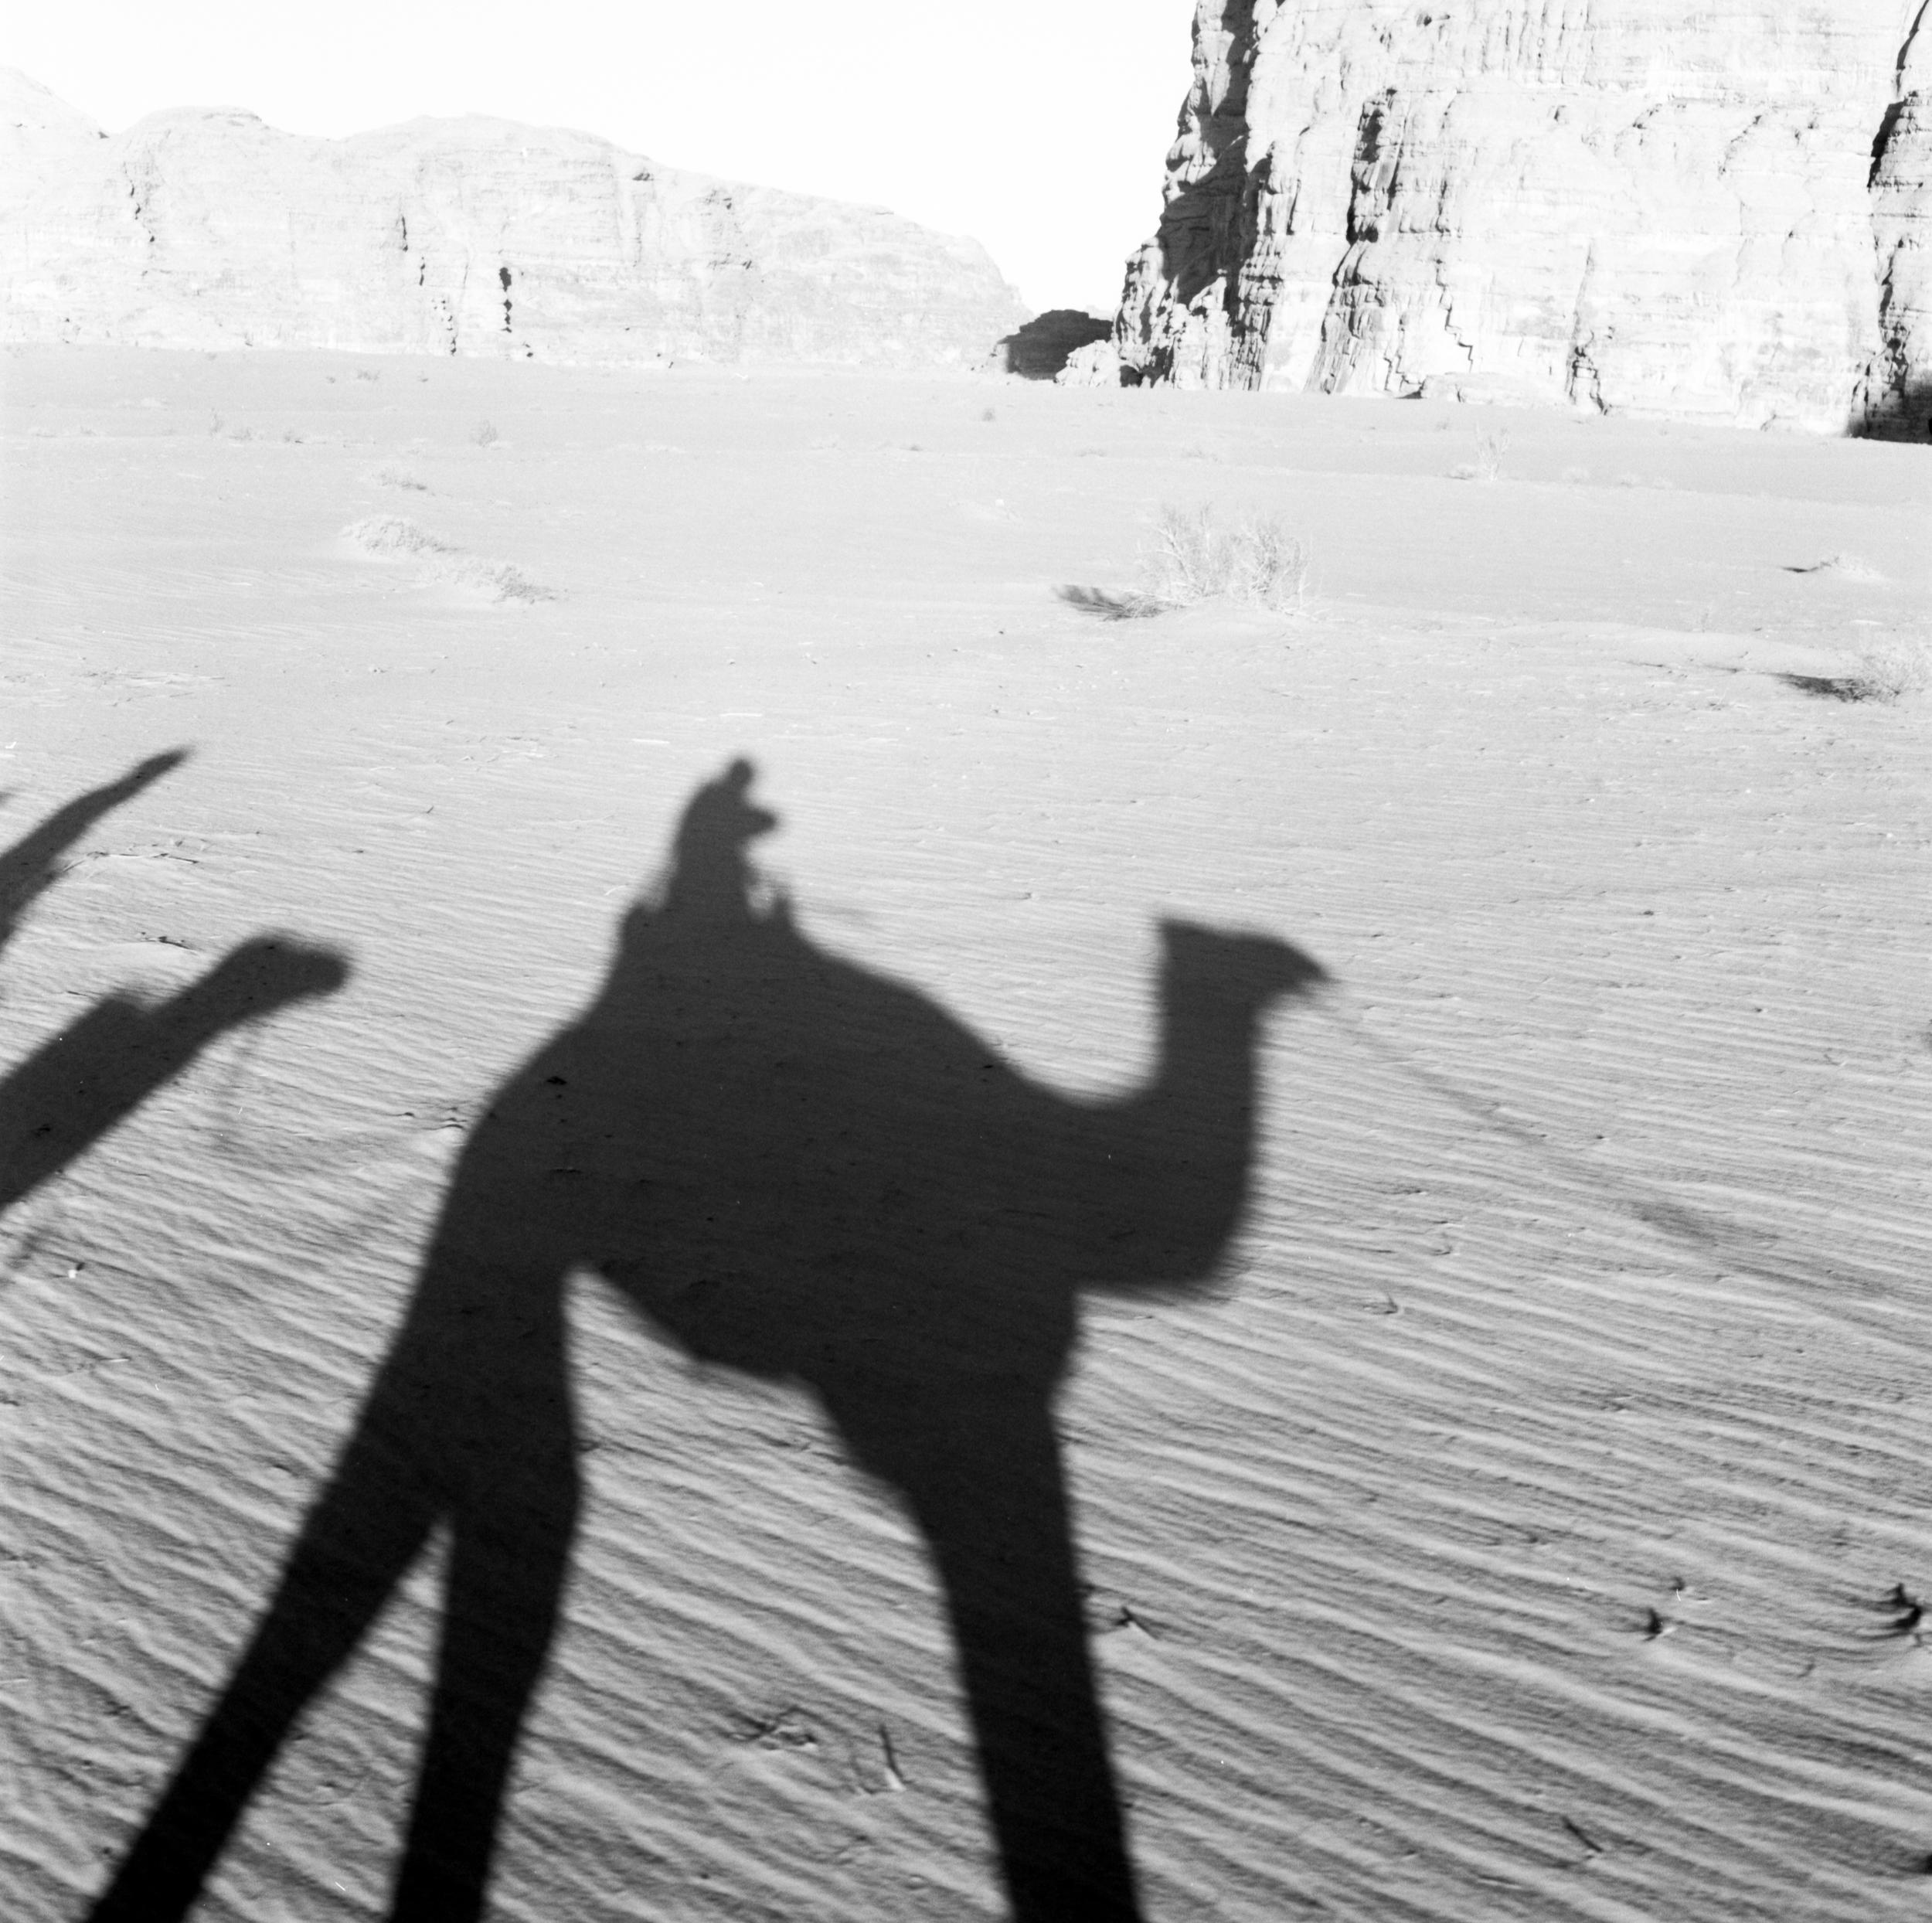 Camel Ride Hasselblad 501c | Fuji Acros